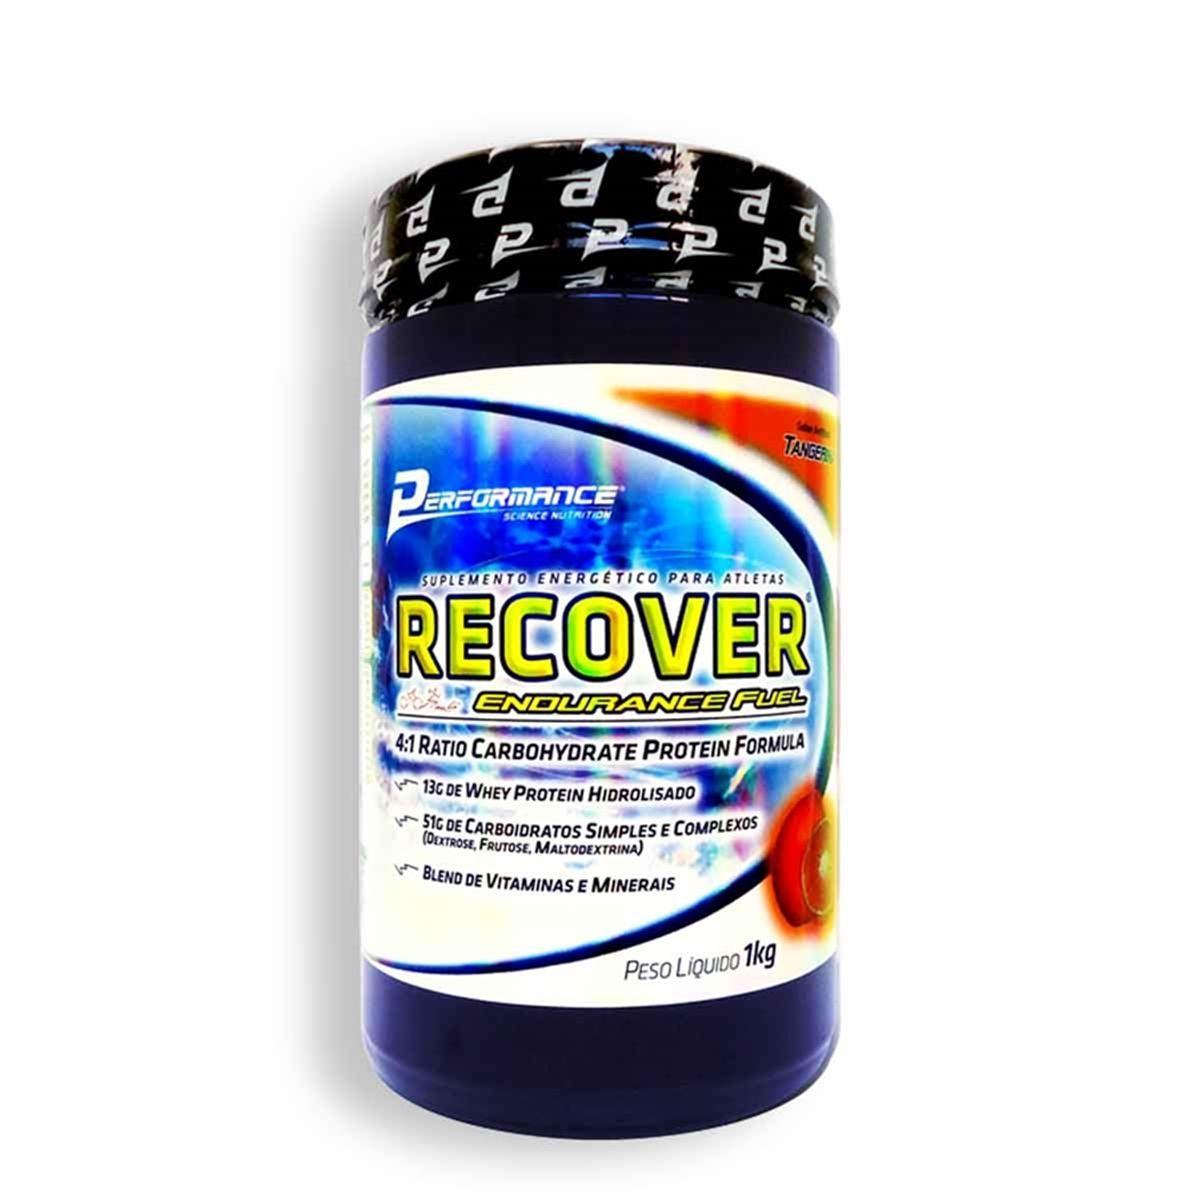 Recover Endurance Fuel 1kg - Performance Nutrition